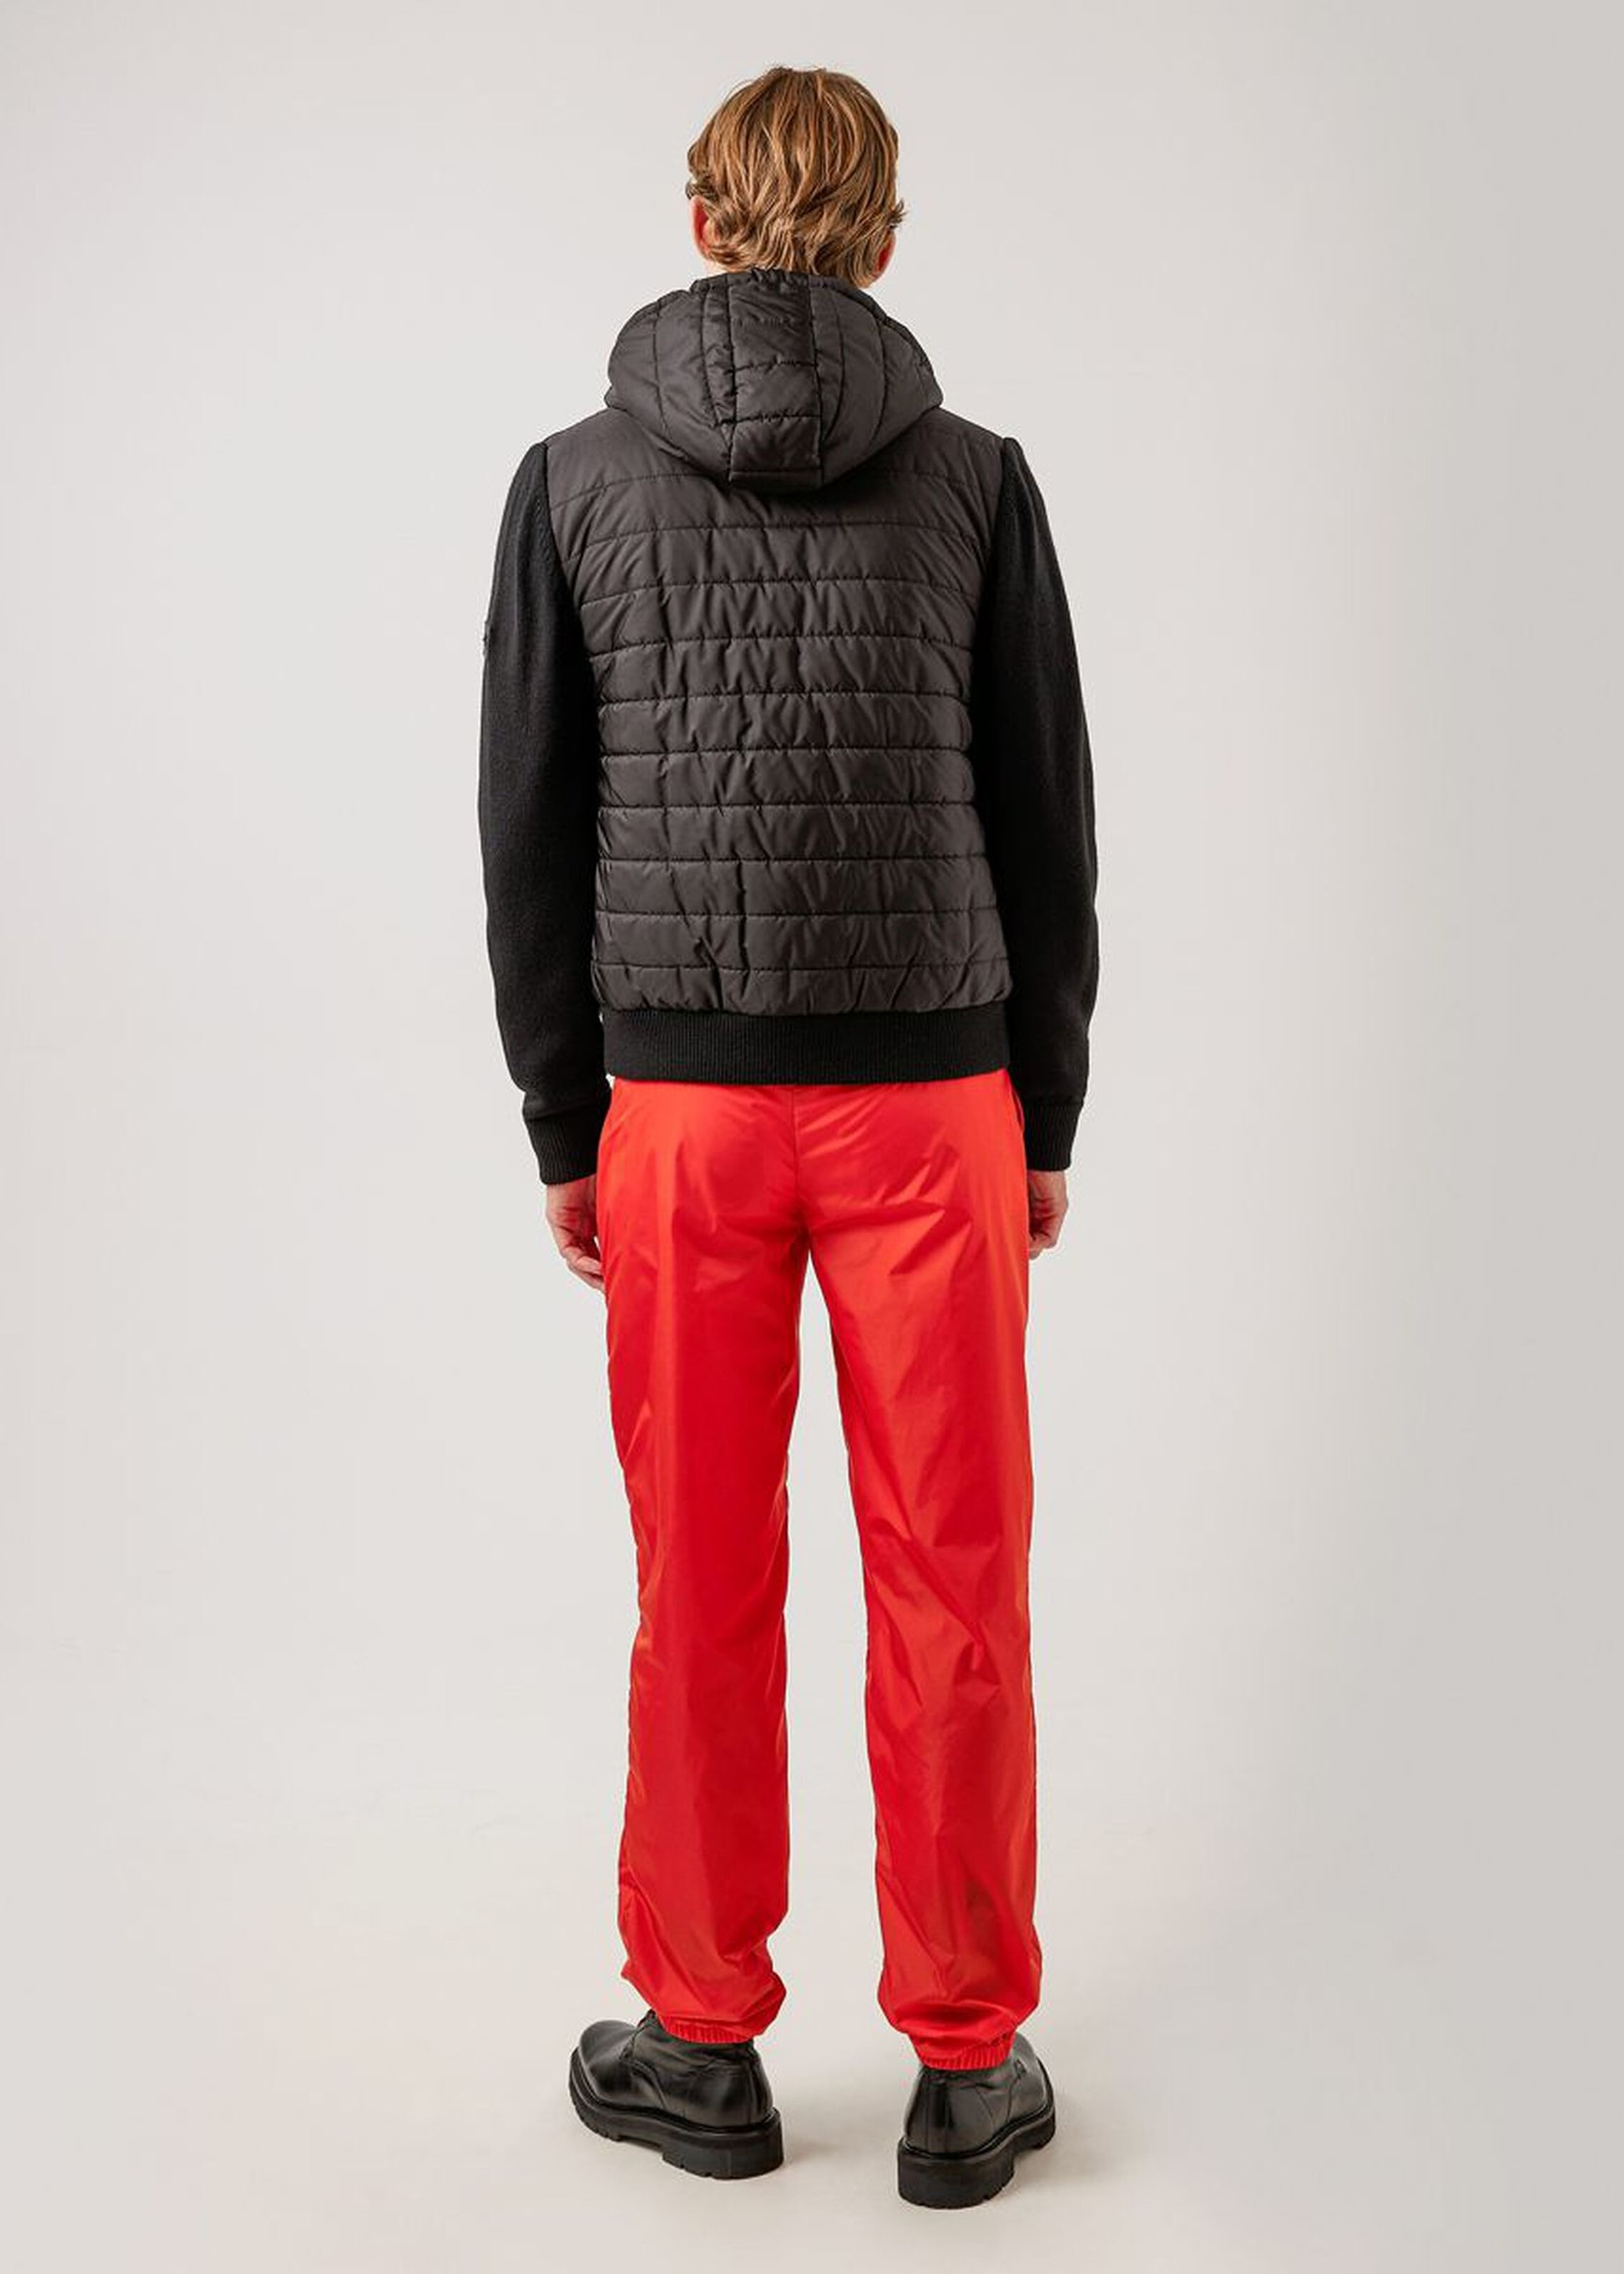 J. Lindeberg Pierre Knitted Hybrid Jacket